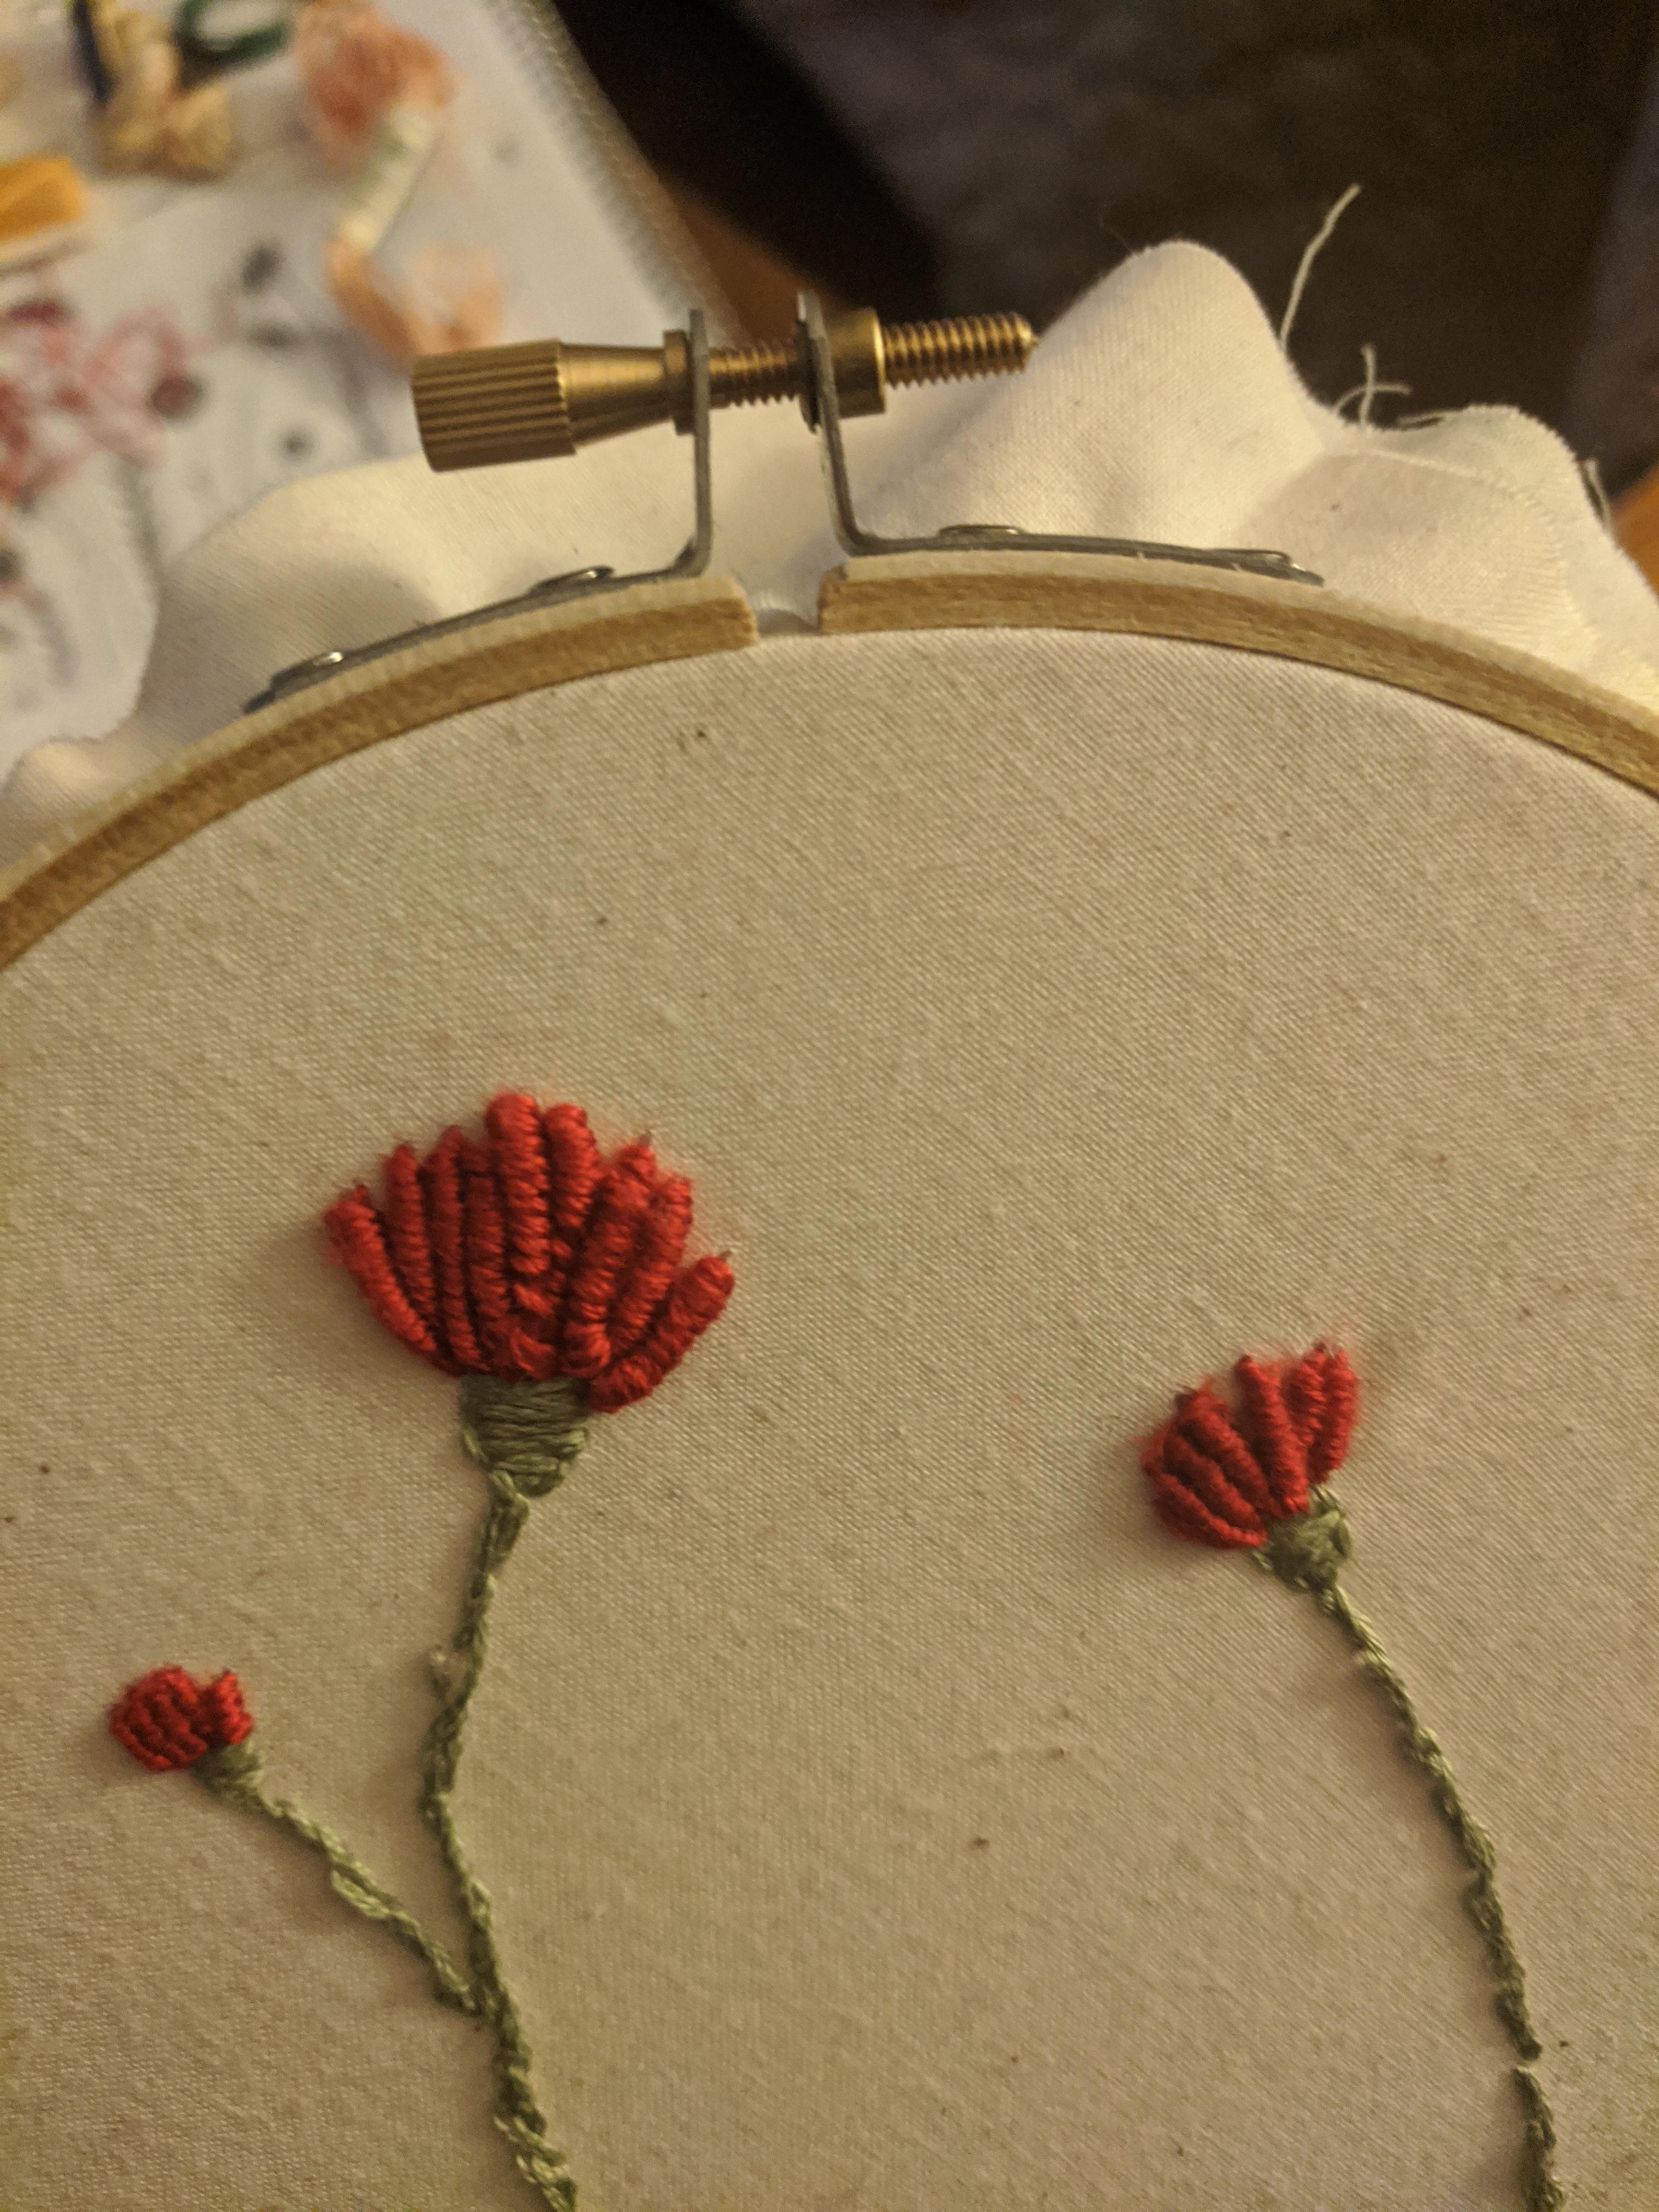 Bullion Stitch Embroidery : bullion, stitch, embroidery, First, Bullion, Stitches!, Embroidery